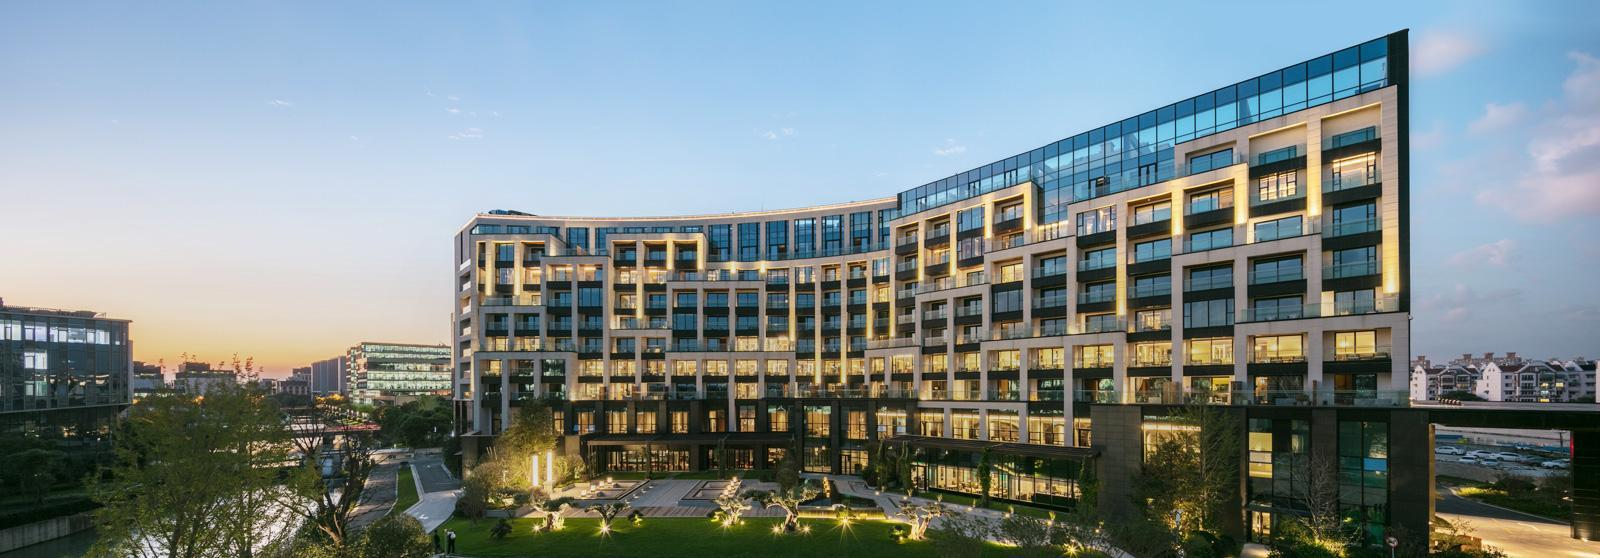 上海阿納迪酒店(The Anandi Hotel and Spa)【 上海,中國】  酒店  www.6545363.live